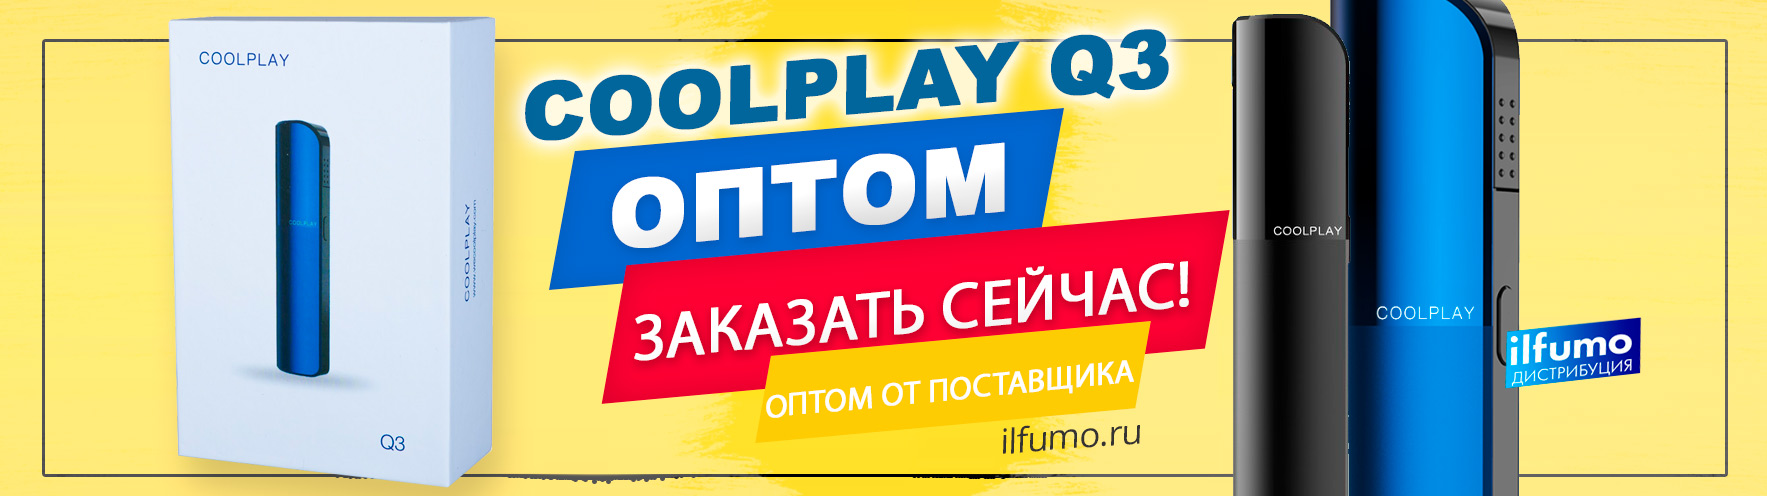 kupit vaporajzer coolplay q3 optom - Вапорайзер Coolplay Q3